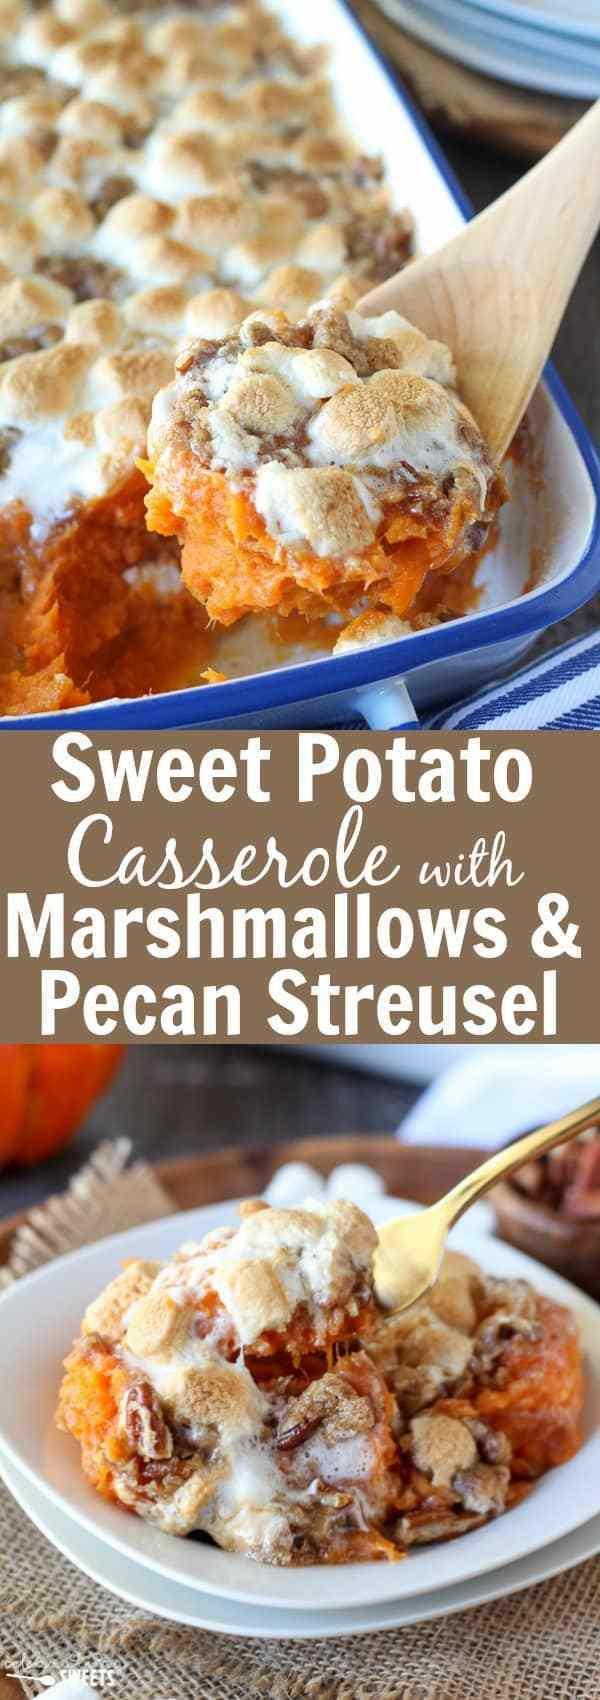 Sweet Potatoes Thanksgiving Marshmallows  Sweet Potato Casserole with Marshmallows & Streusel